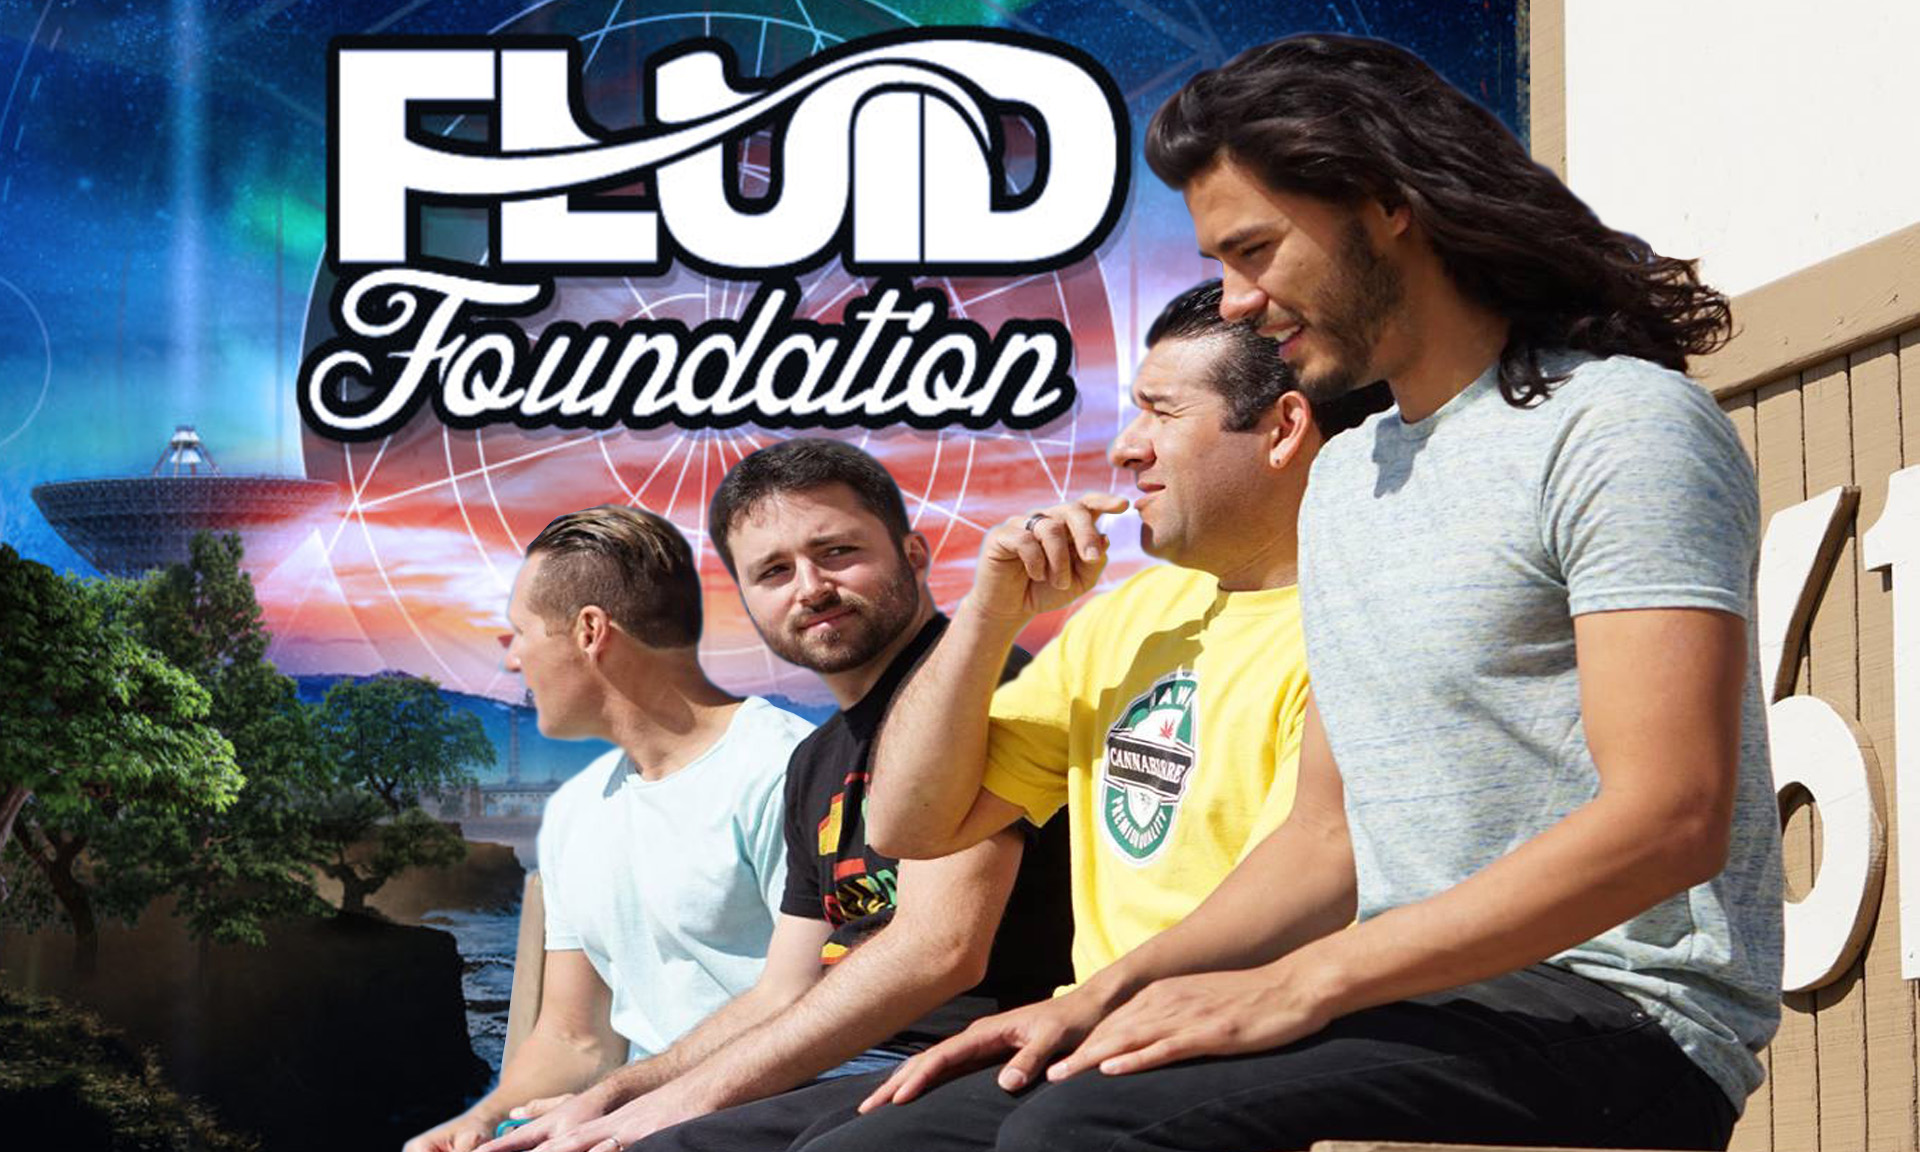 Fluid Foundation Release Self-Titled Debut Album